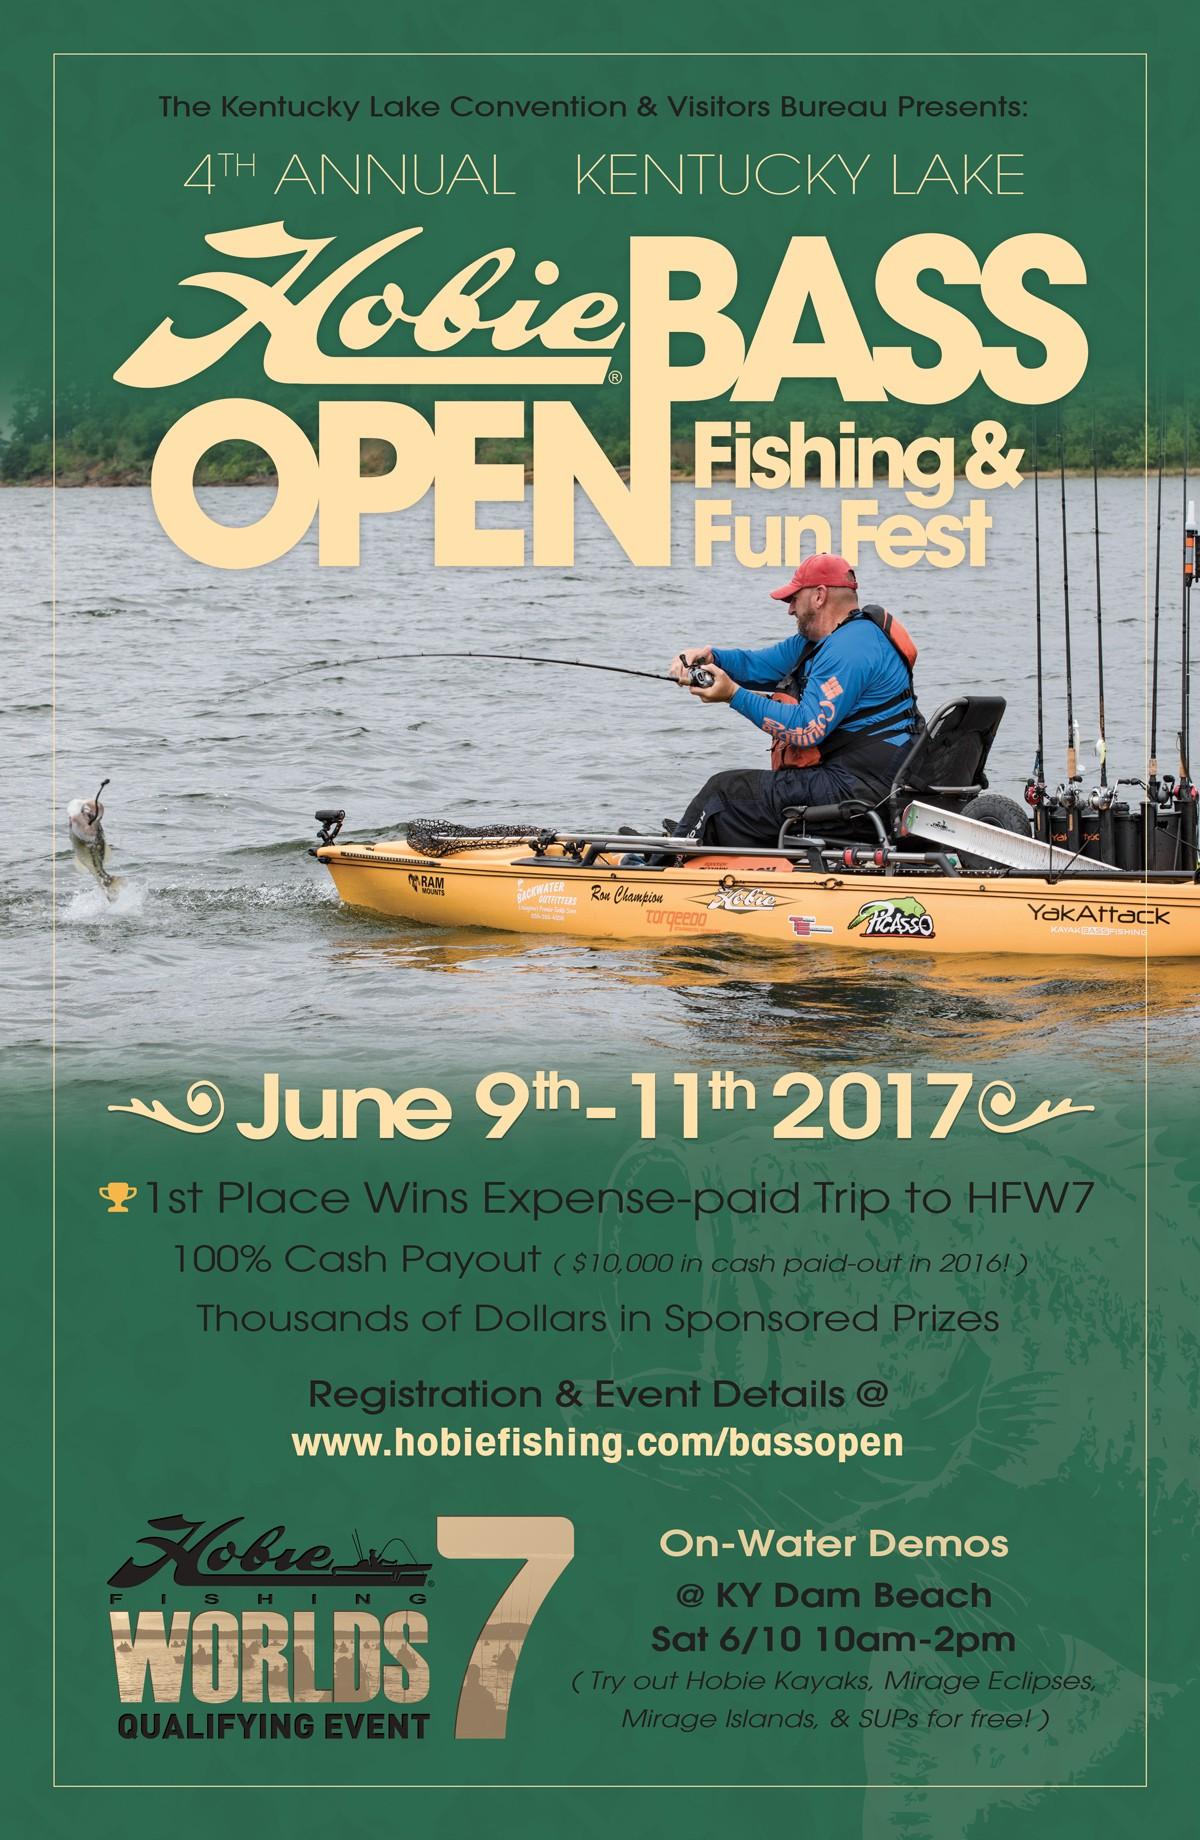 Article image - 2017 Hobie Bass Open